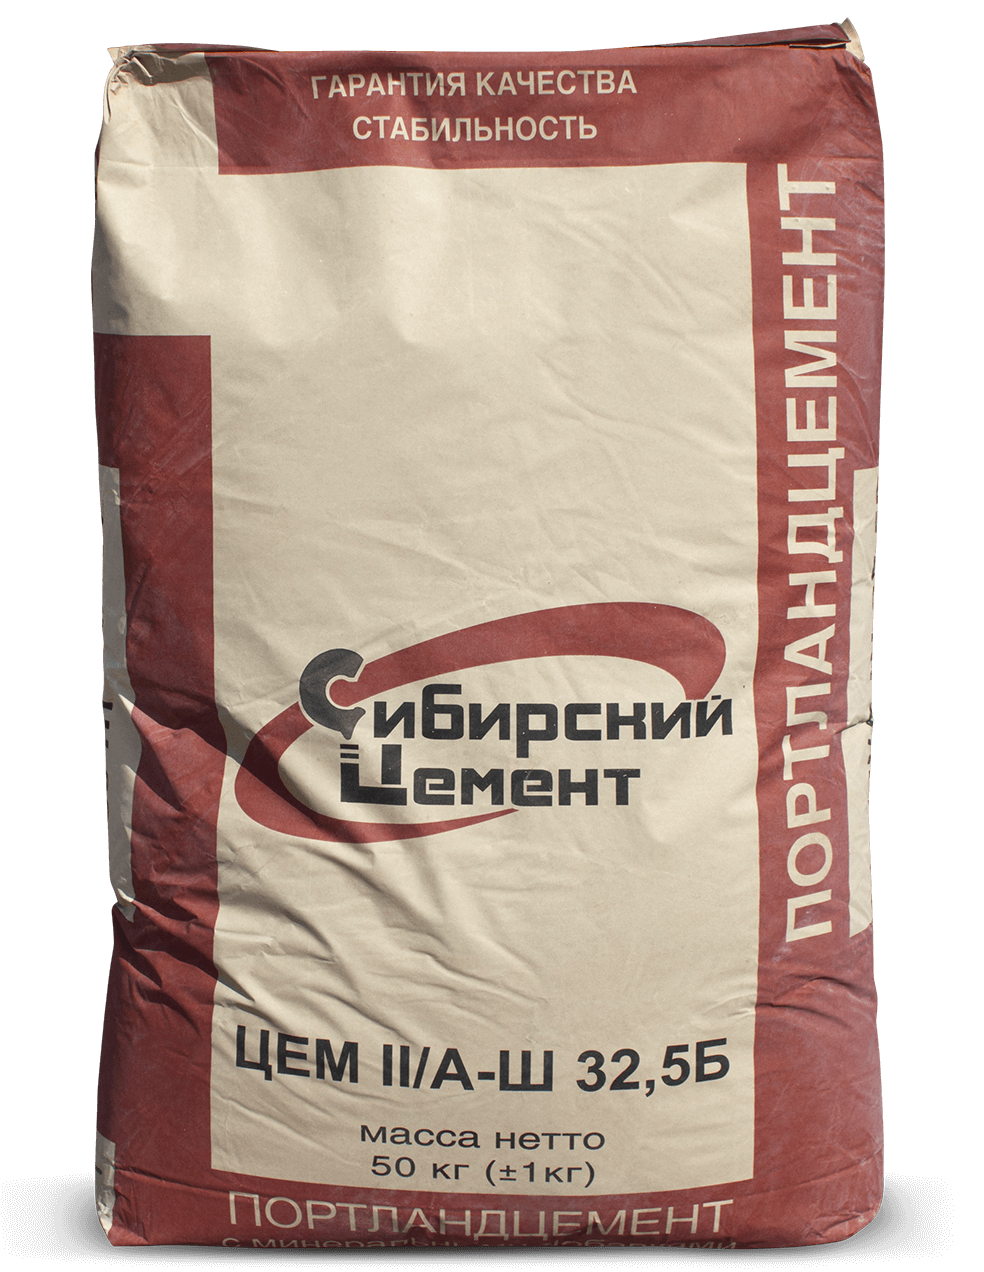 Топкинский цемент ЦЕМ II/А-Ш 32,5 Б (ПЦ 400 Д20)